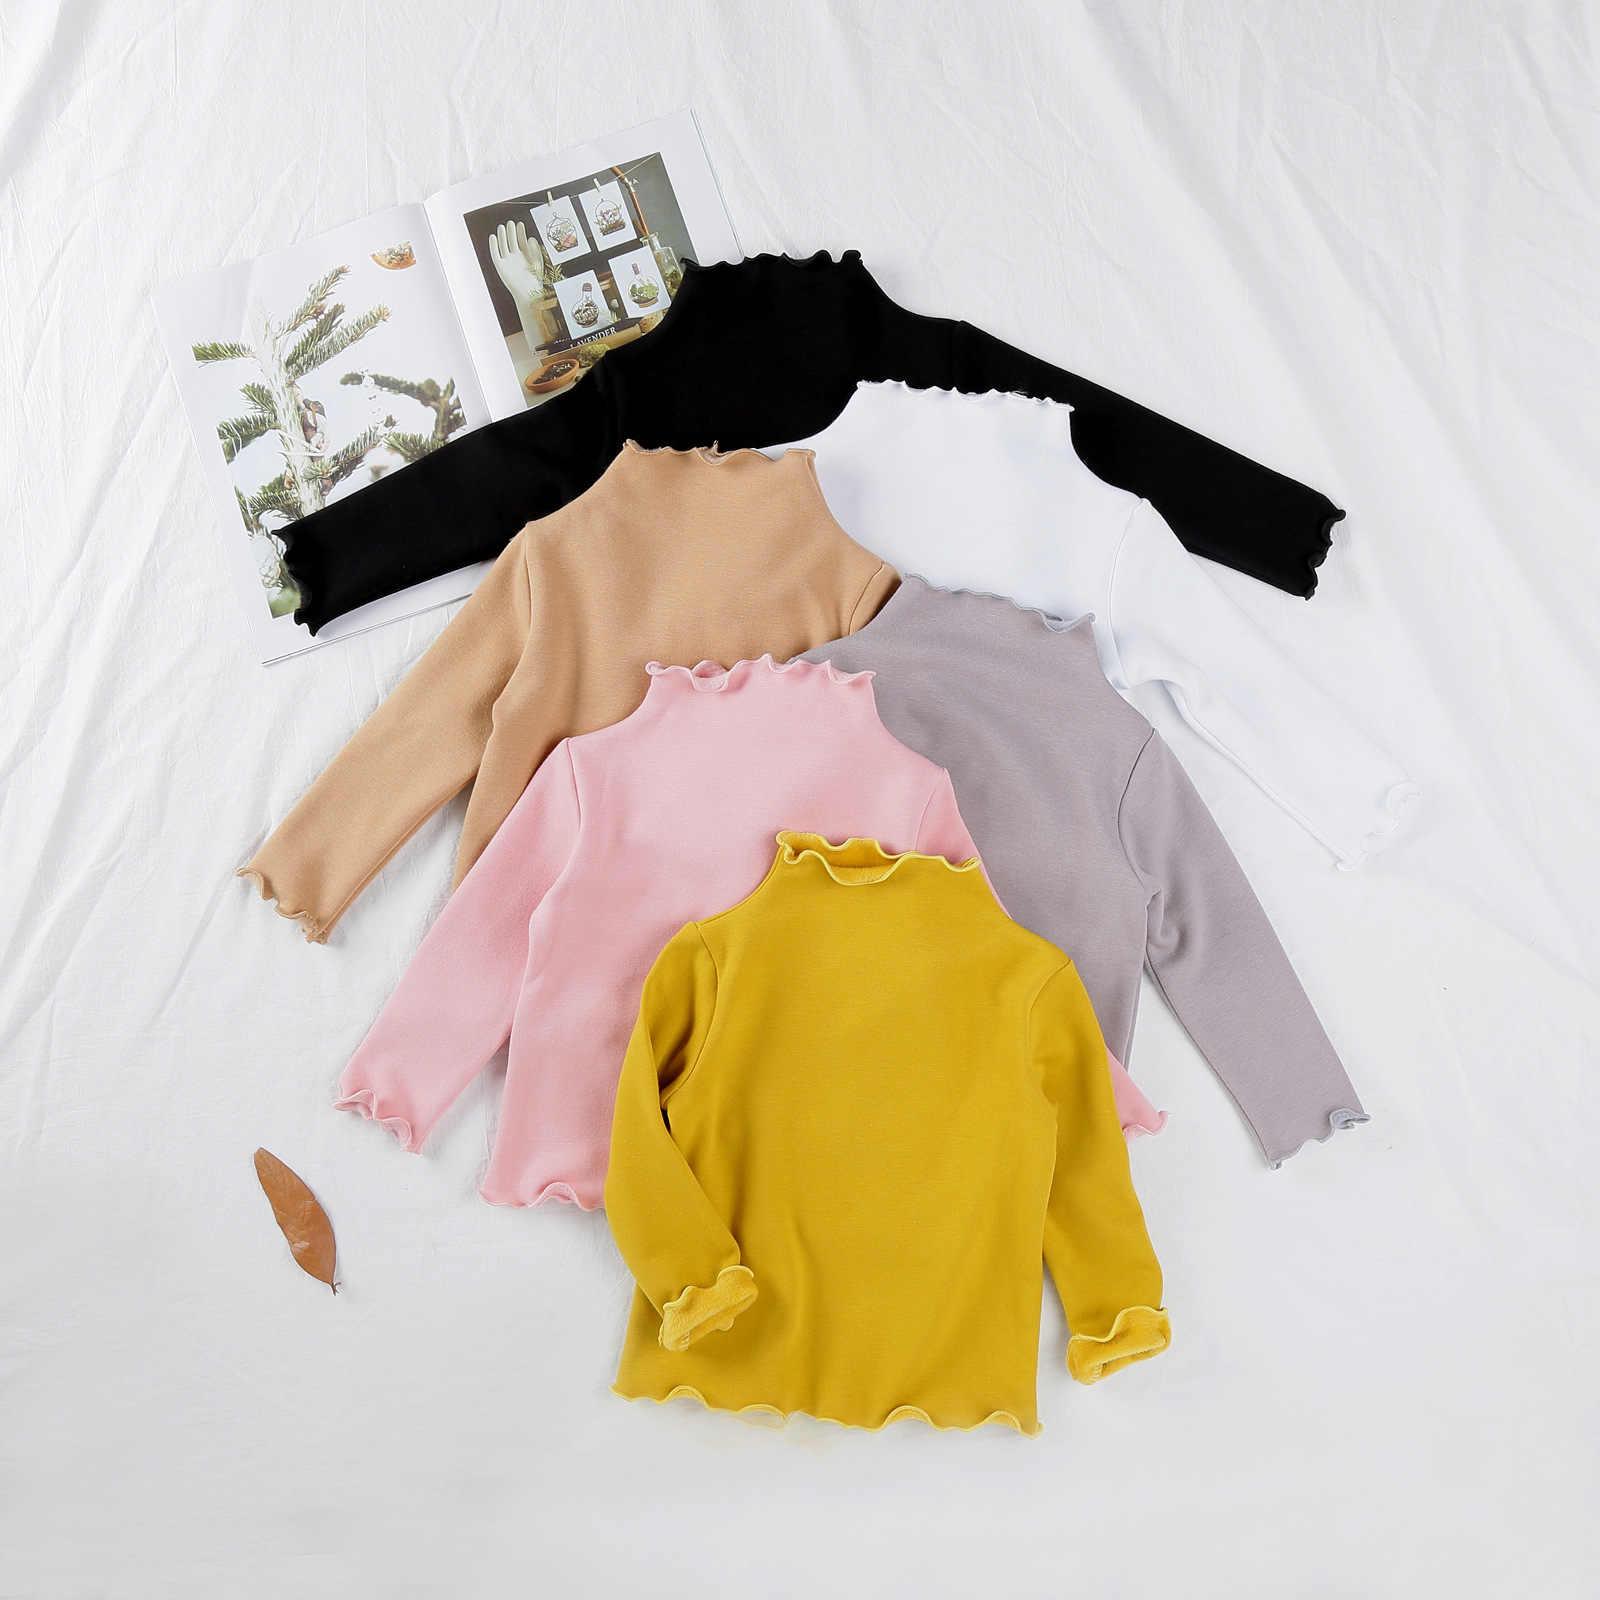 ea0eec76 Winter Baby Girl T Shirts Velvet Thick Warm Toddler Girls Tops Blouse Long  Sleeve Turtleneck Bottoming